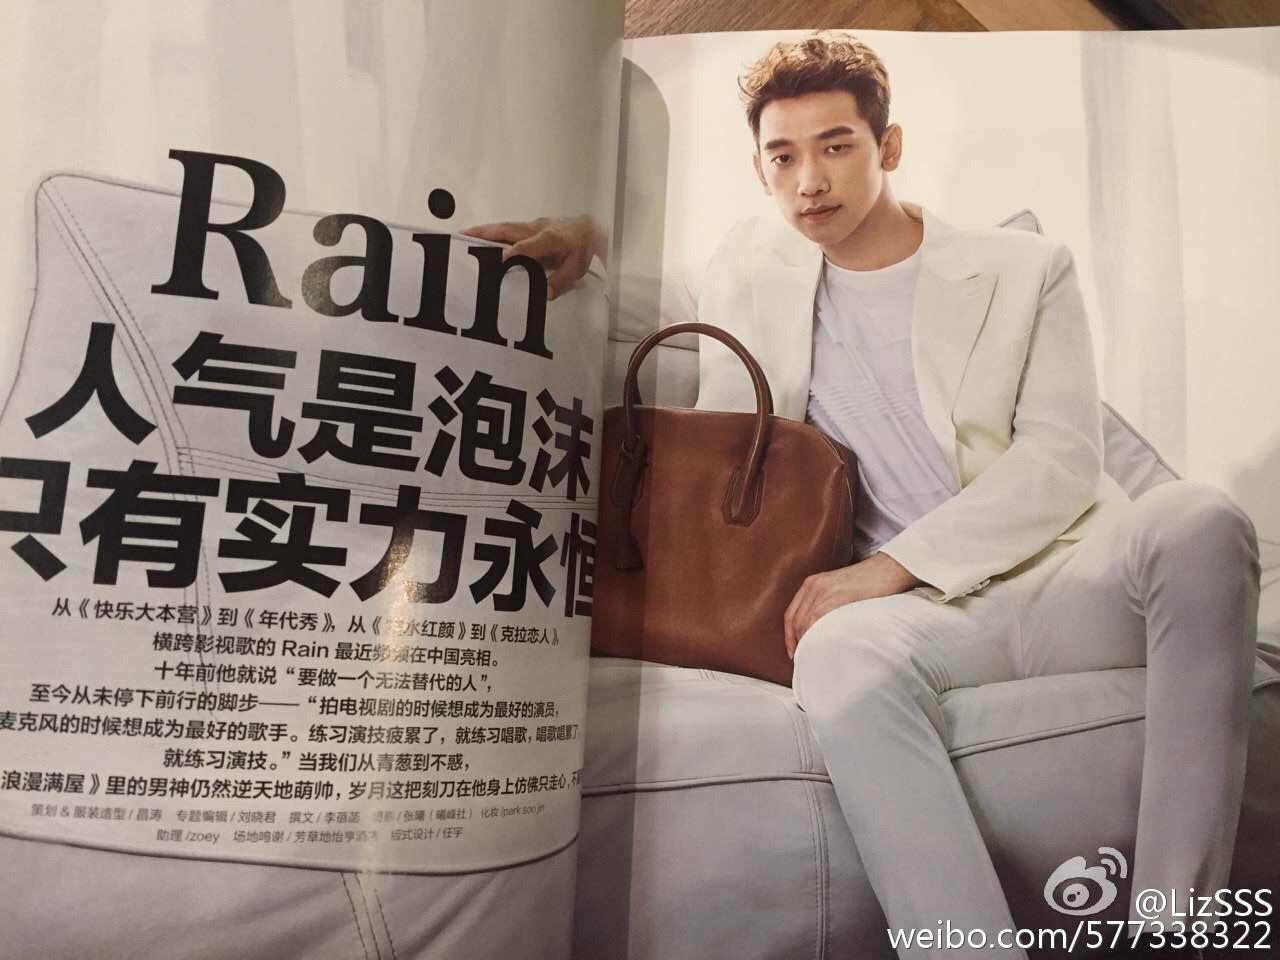 Rain 男人风尚 Leon Magazine _c0047605_758114.jpg